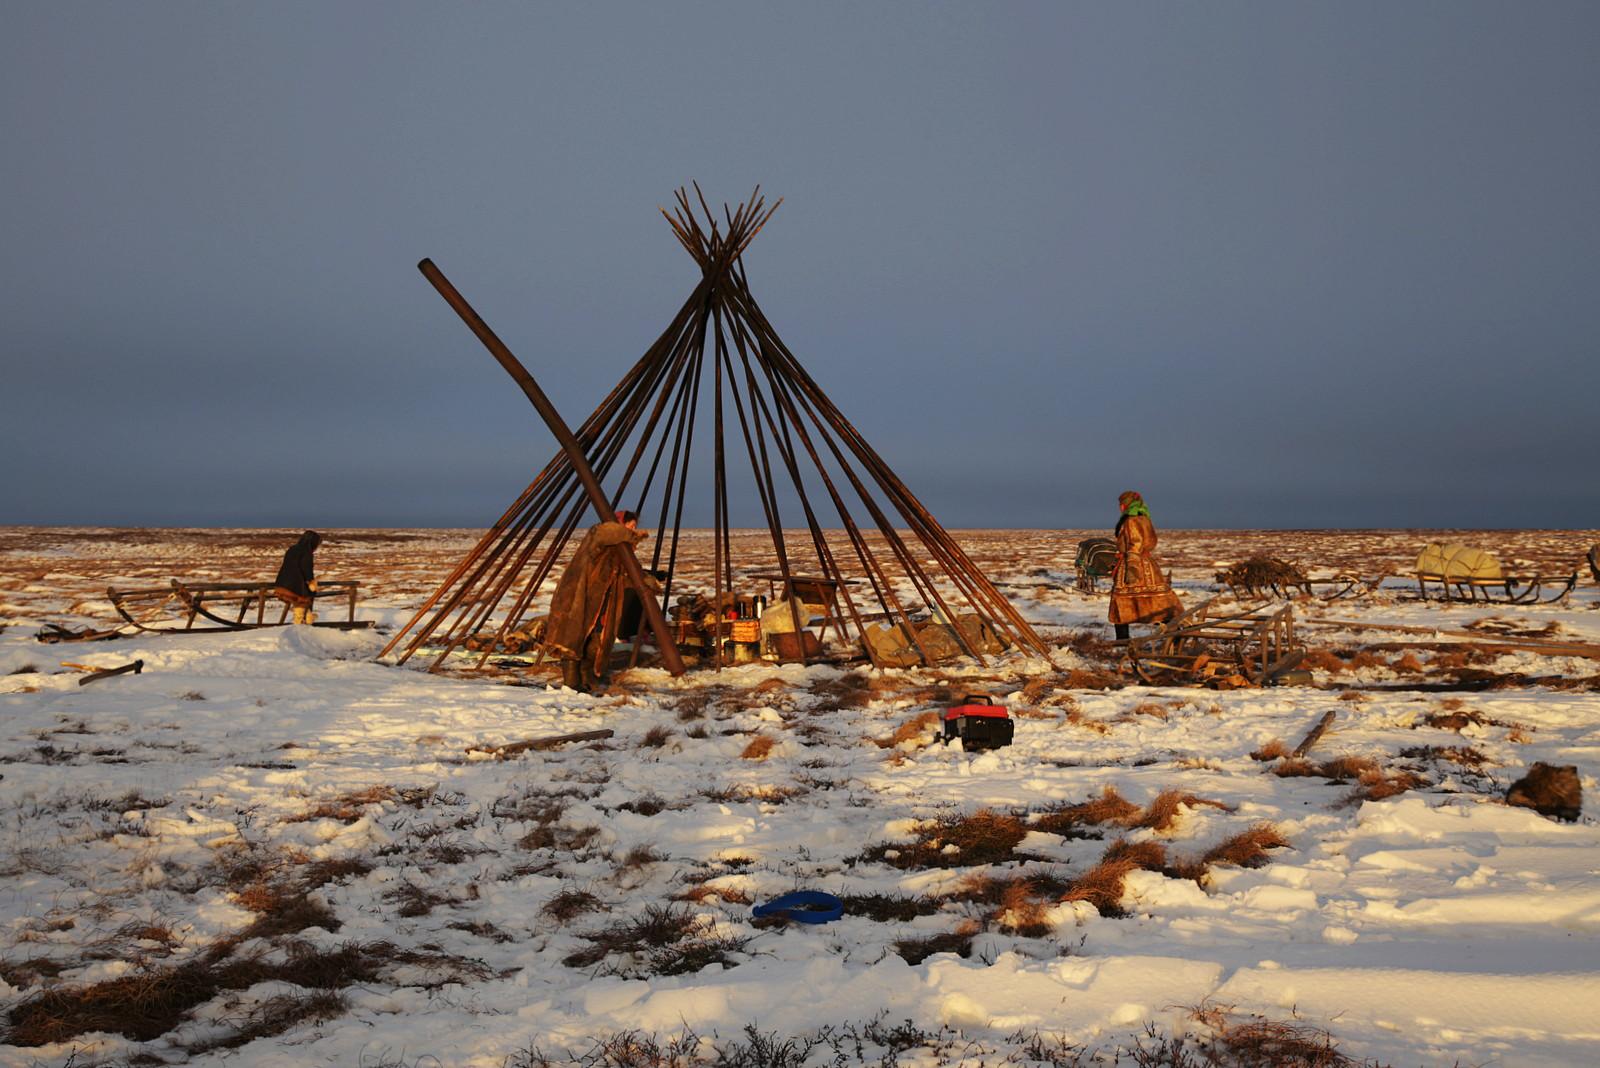 Pembongkaran chum, rumah tradisional suku Nenet.